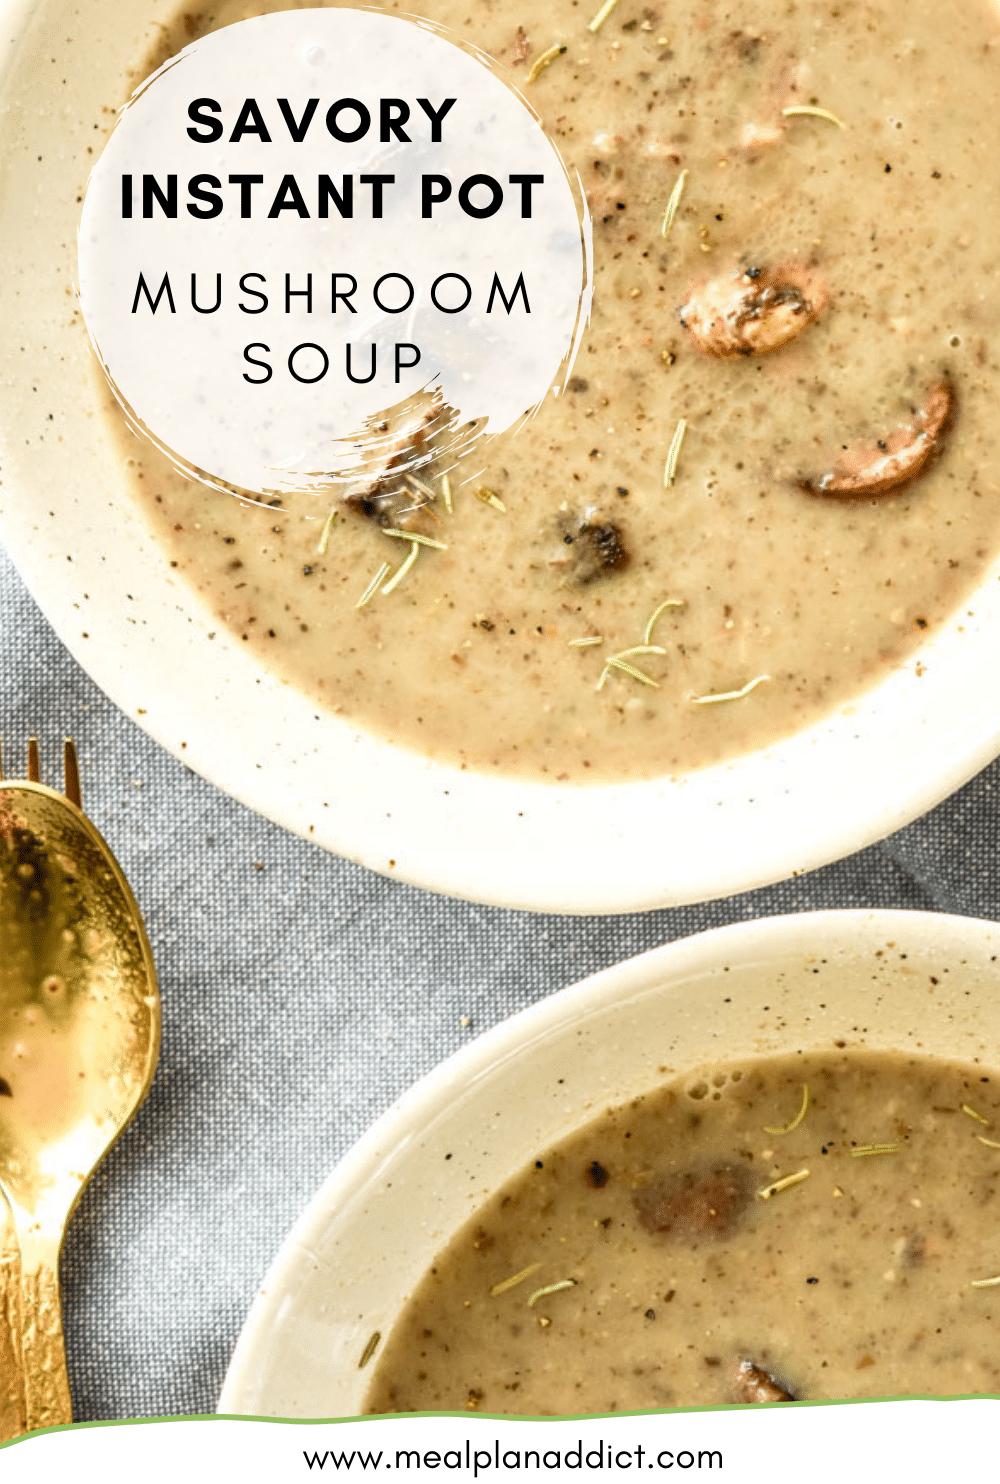 Savory Instant Pot Mushroom Soup